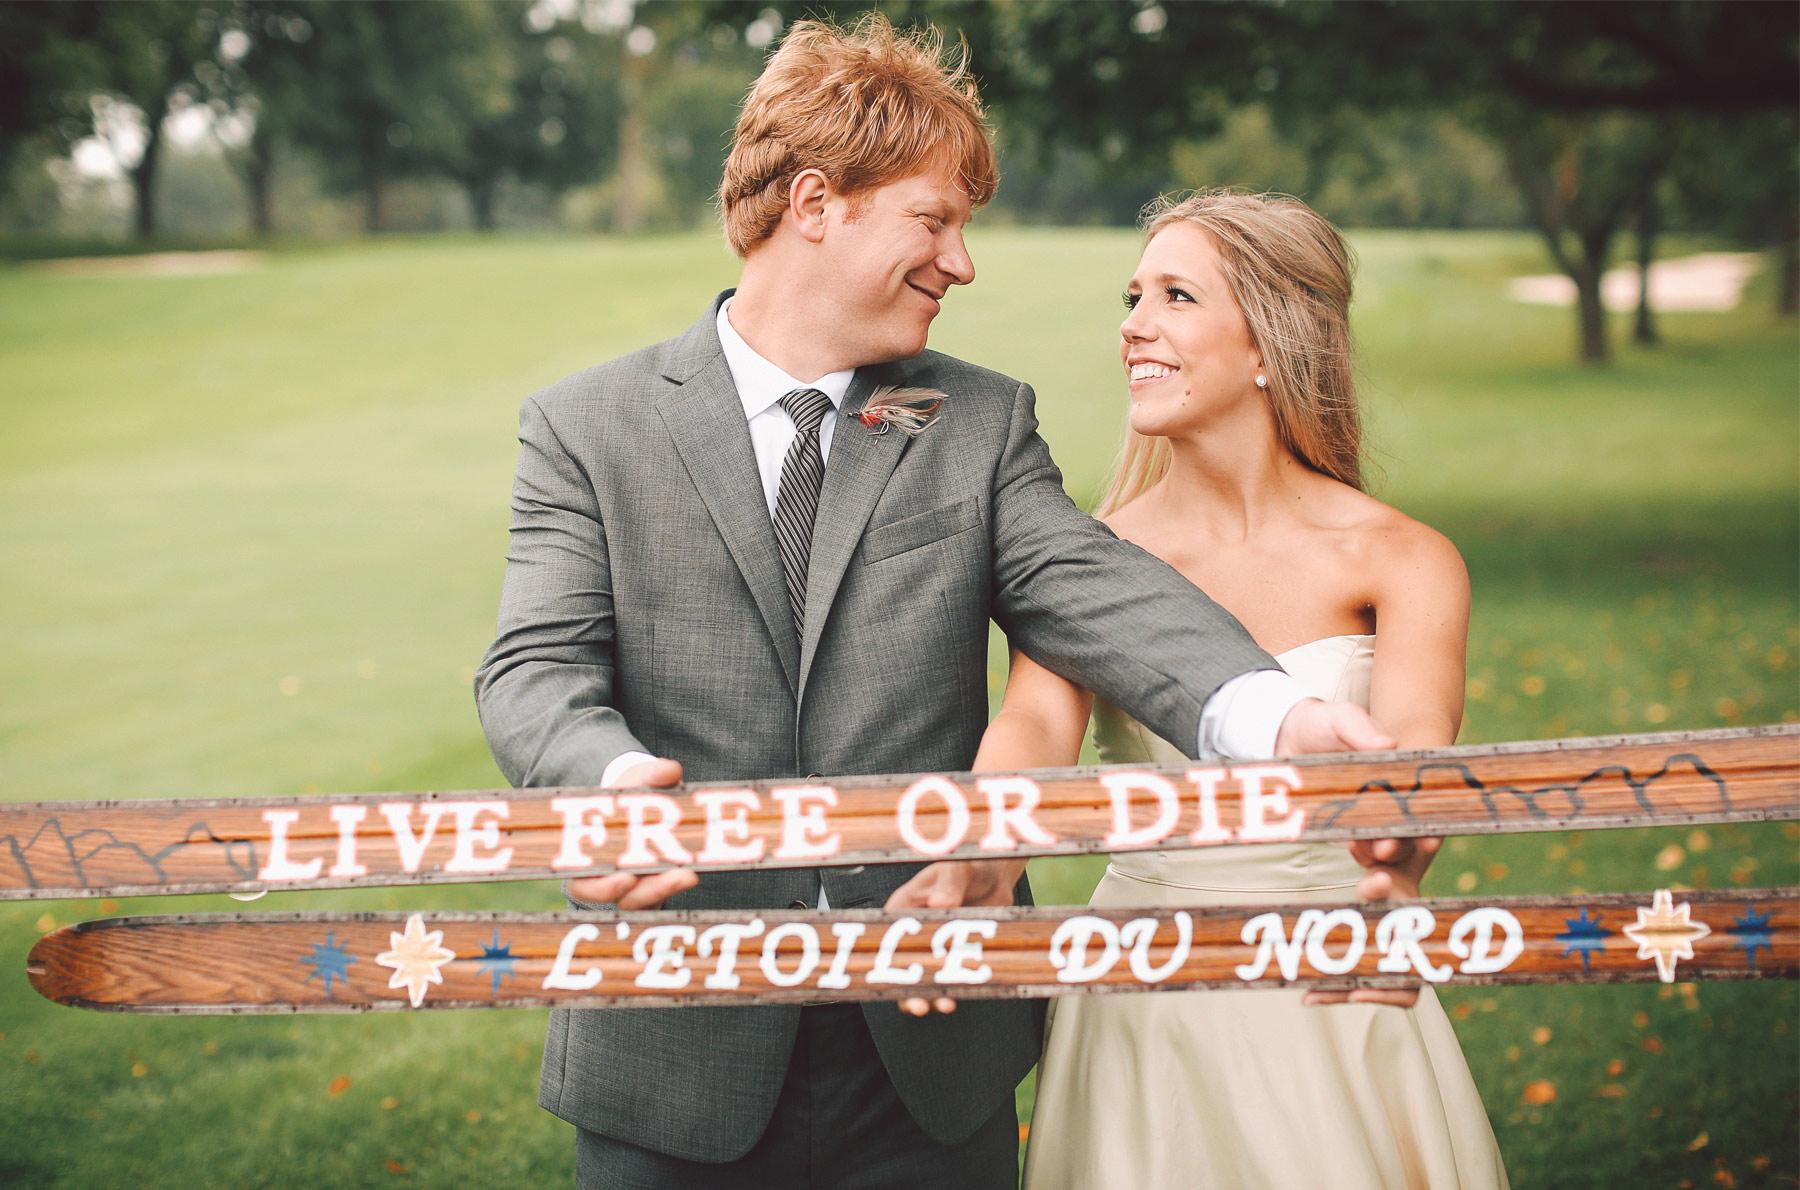 18-Minneapolis-Minnesota-Wedding-Photographer-by-Andrew-Vick-Photography-Fall-Autumn-Minikahda-Club-Bride-Groom-Shot-Ski-Golf-Course-Vintage-Krissy-and-James.jpg